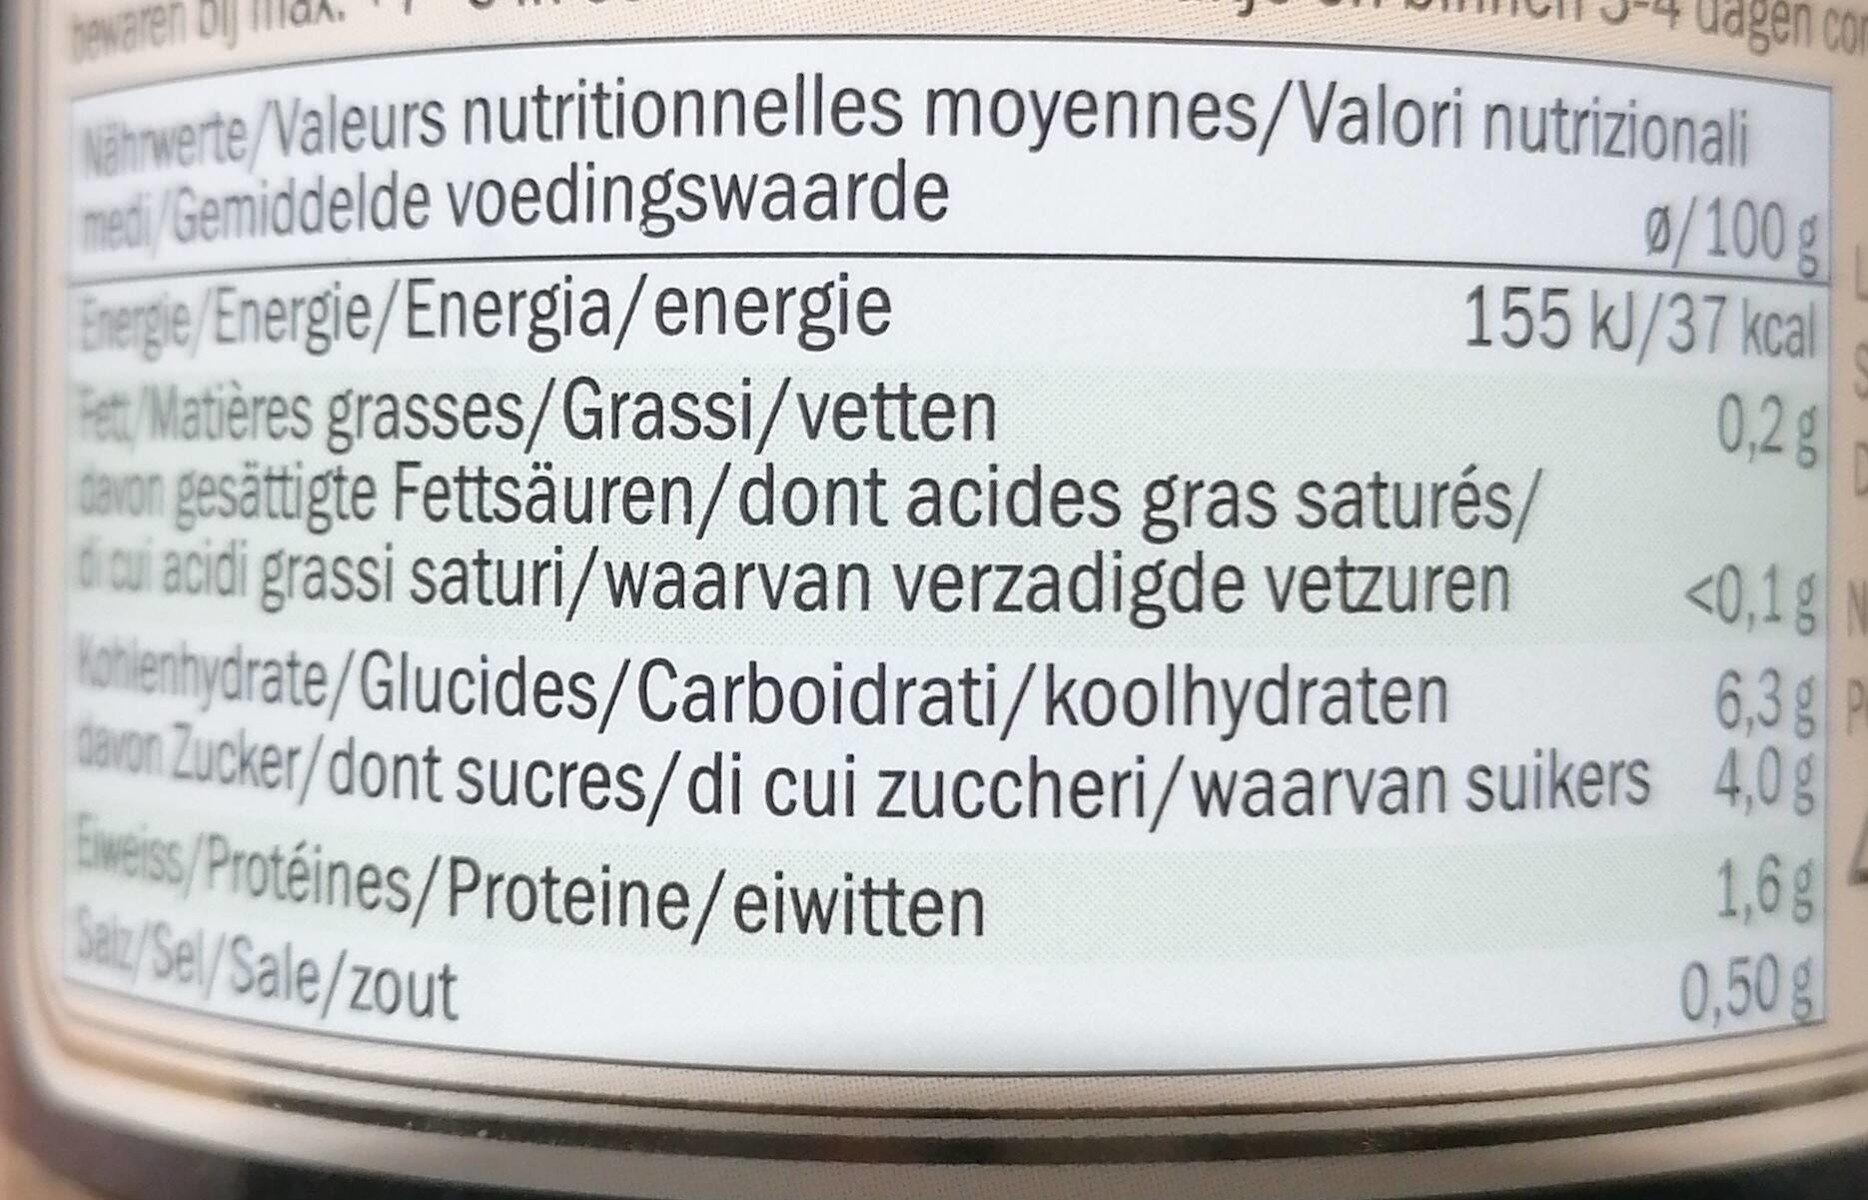 Polpa di pomodoro con erbe - Nährwertangaben - pl